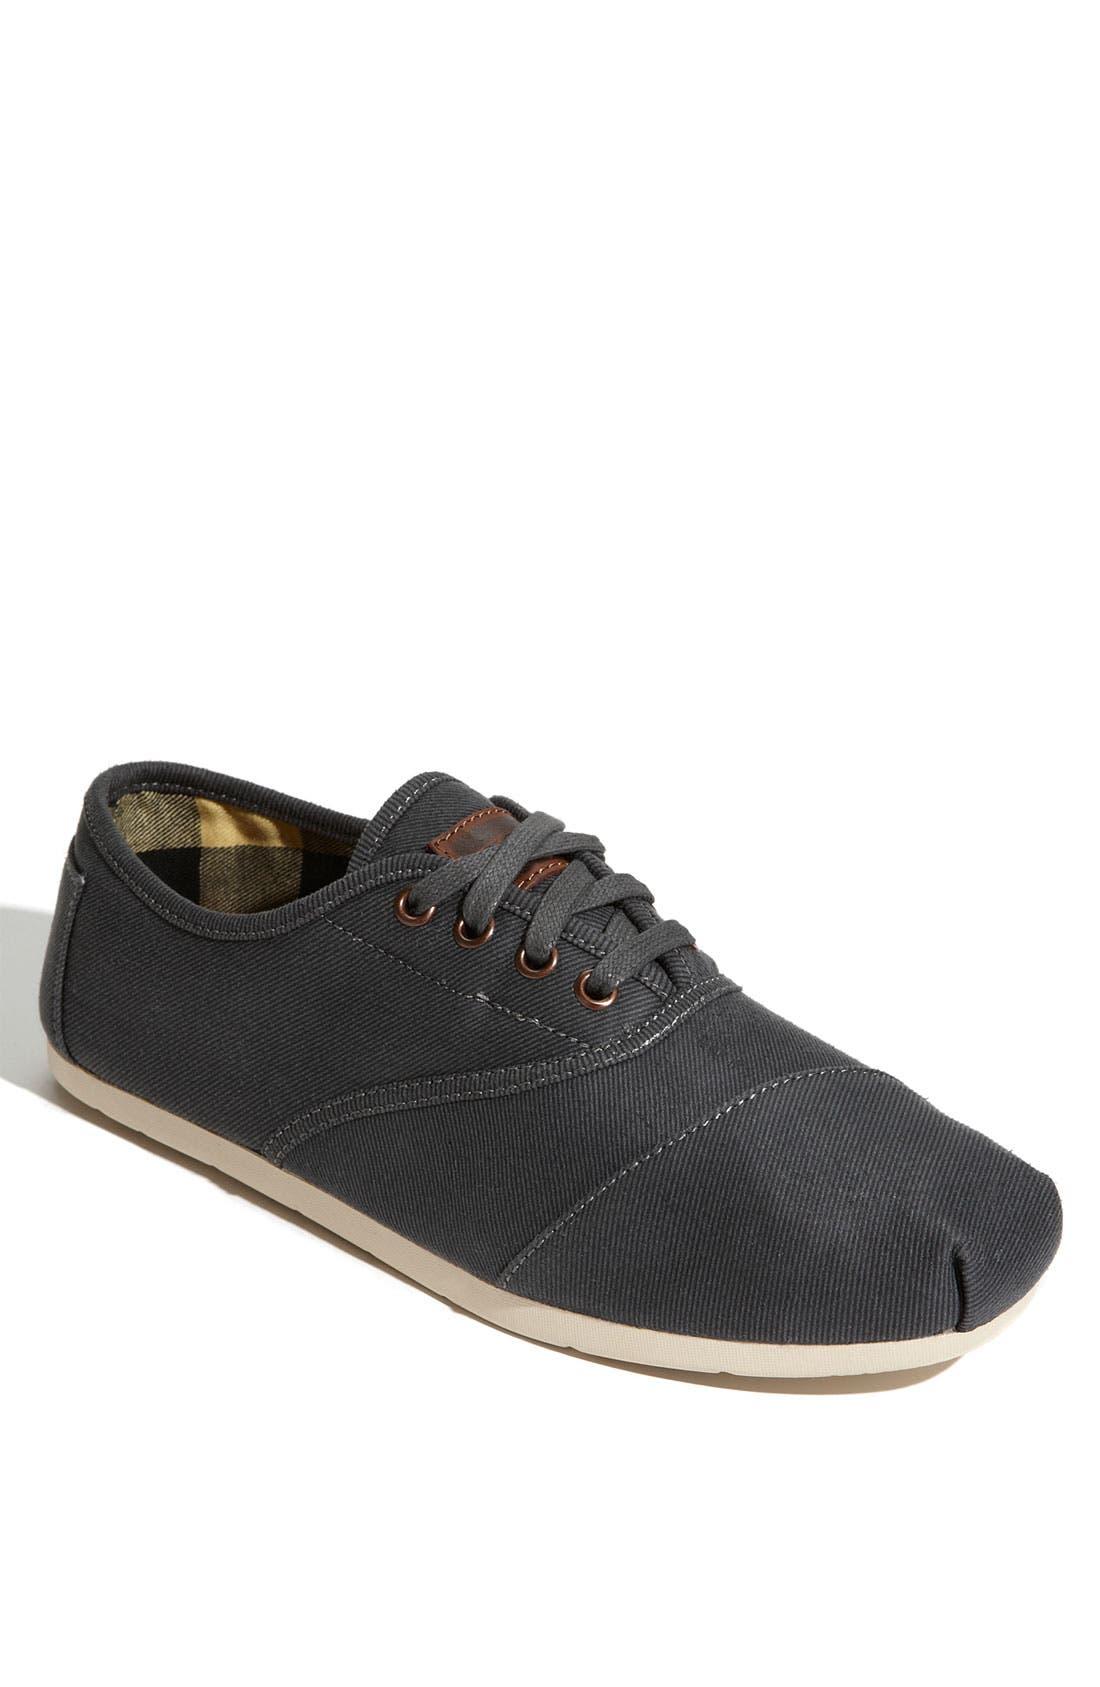 Main Image - TOMS 'Cordones' Waxed Canvas Sneaker (Men)